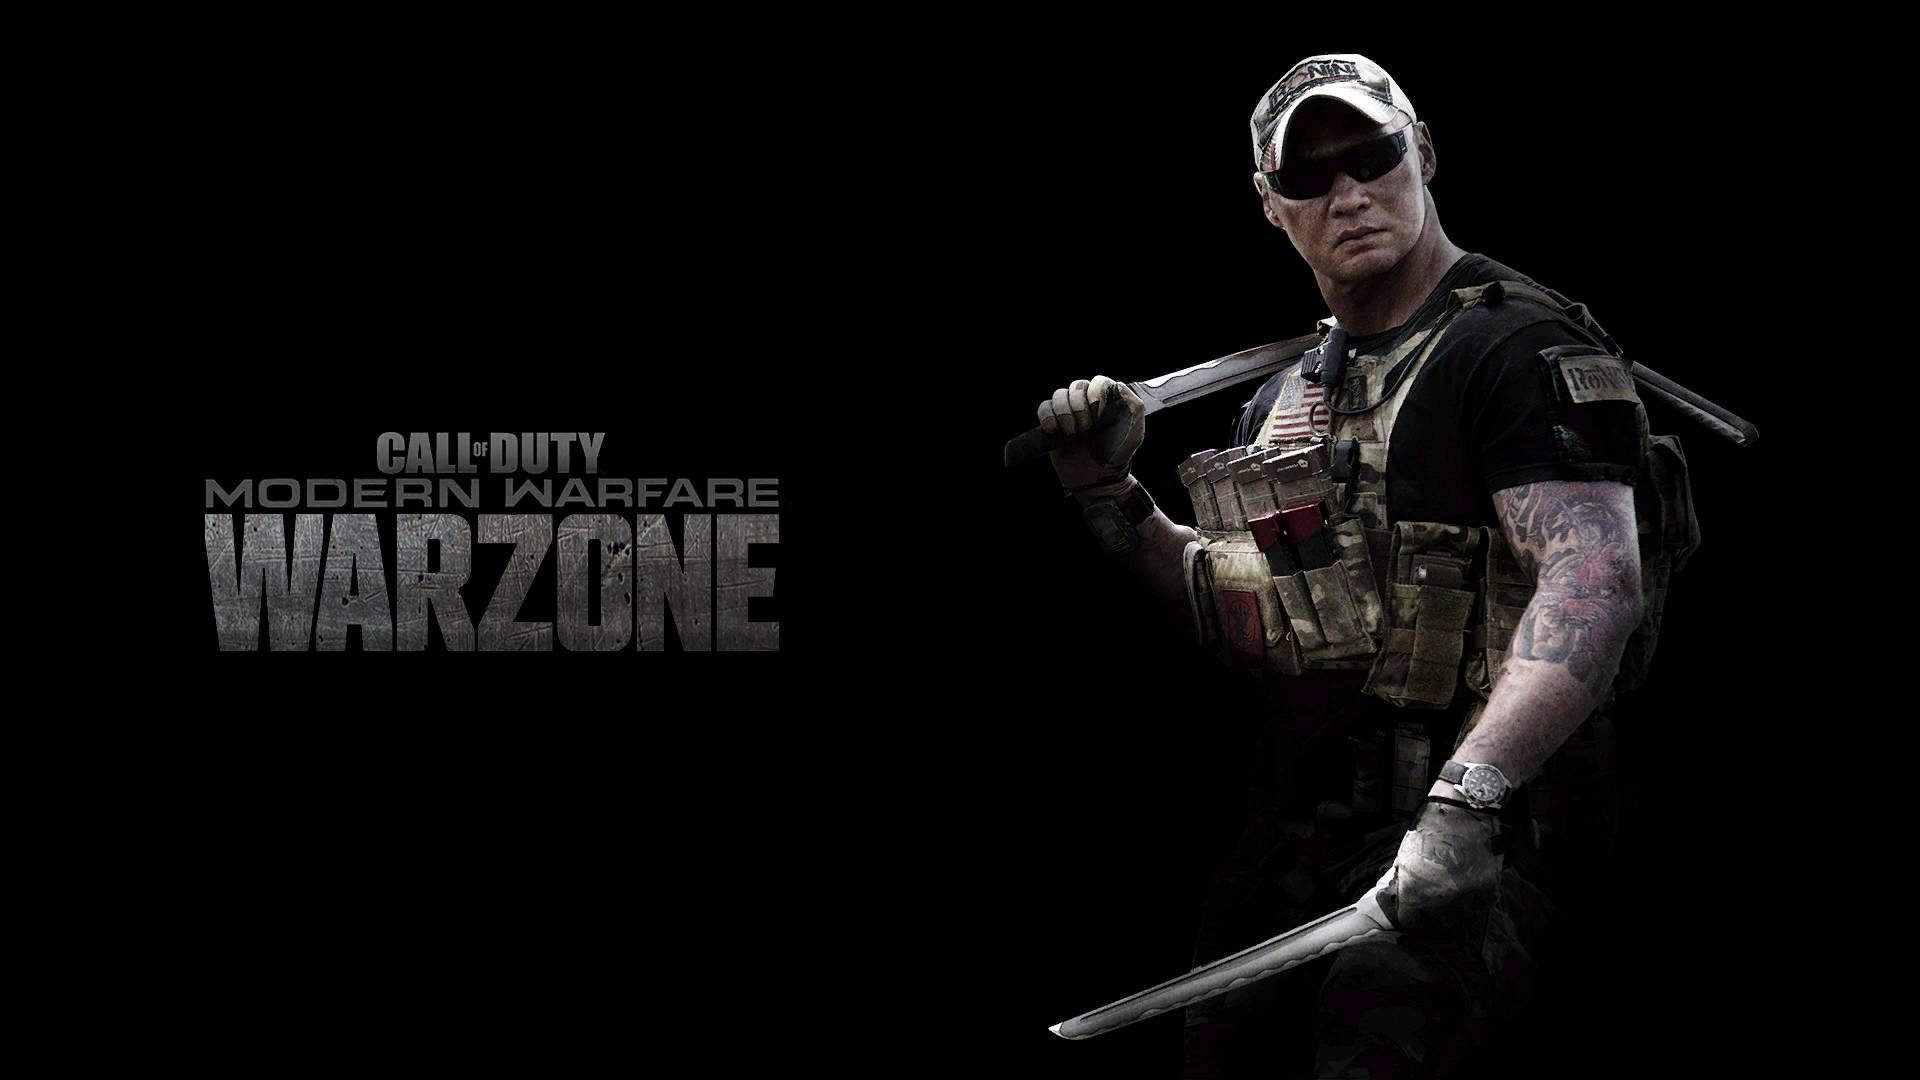 Call Of Duty Warzone Wallpaper 2 By Thetruemask On Deviantart